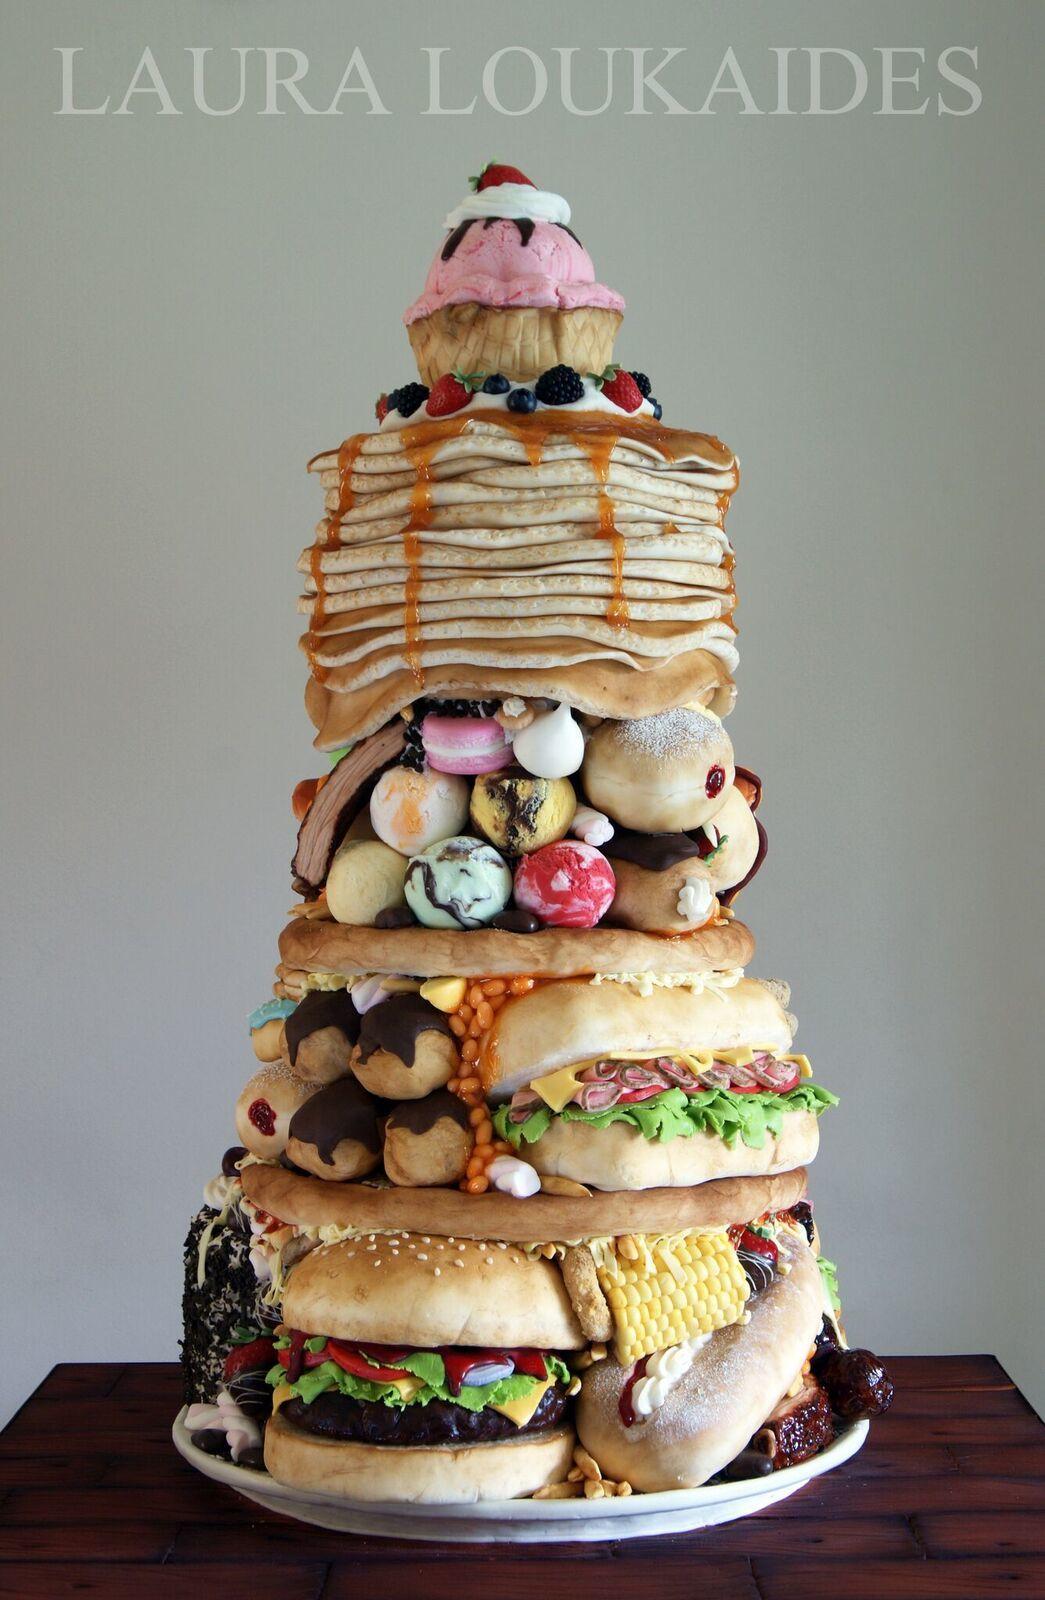 Stack of junk food cake